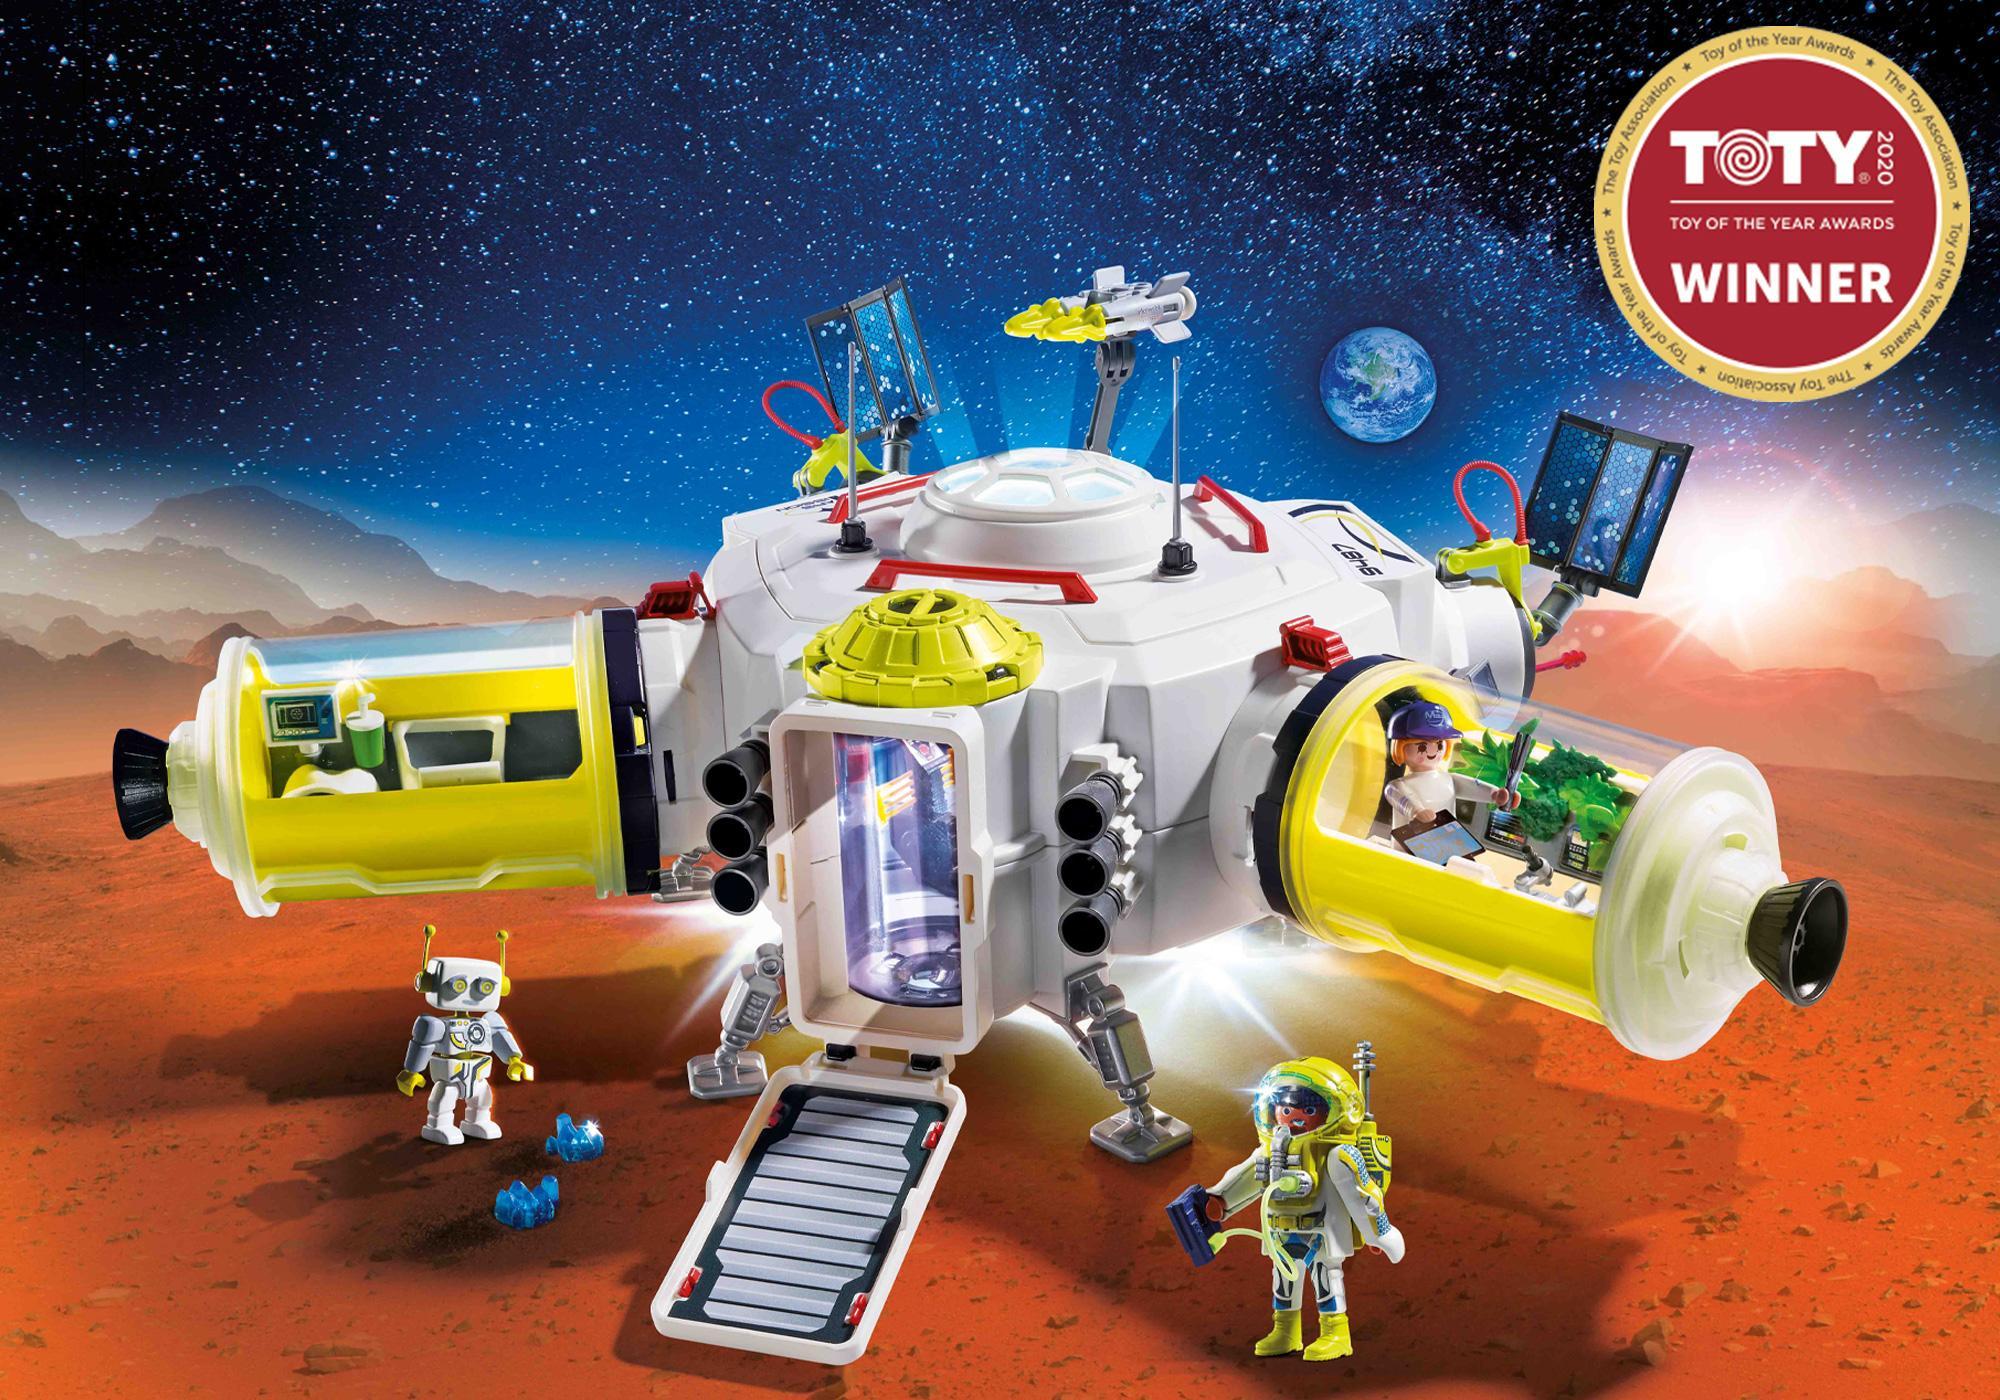 http://media.playmobil.com/i/playmobil/9487_product_detail/Διαστημικός Σταθμός στον Άρη